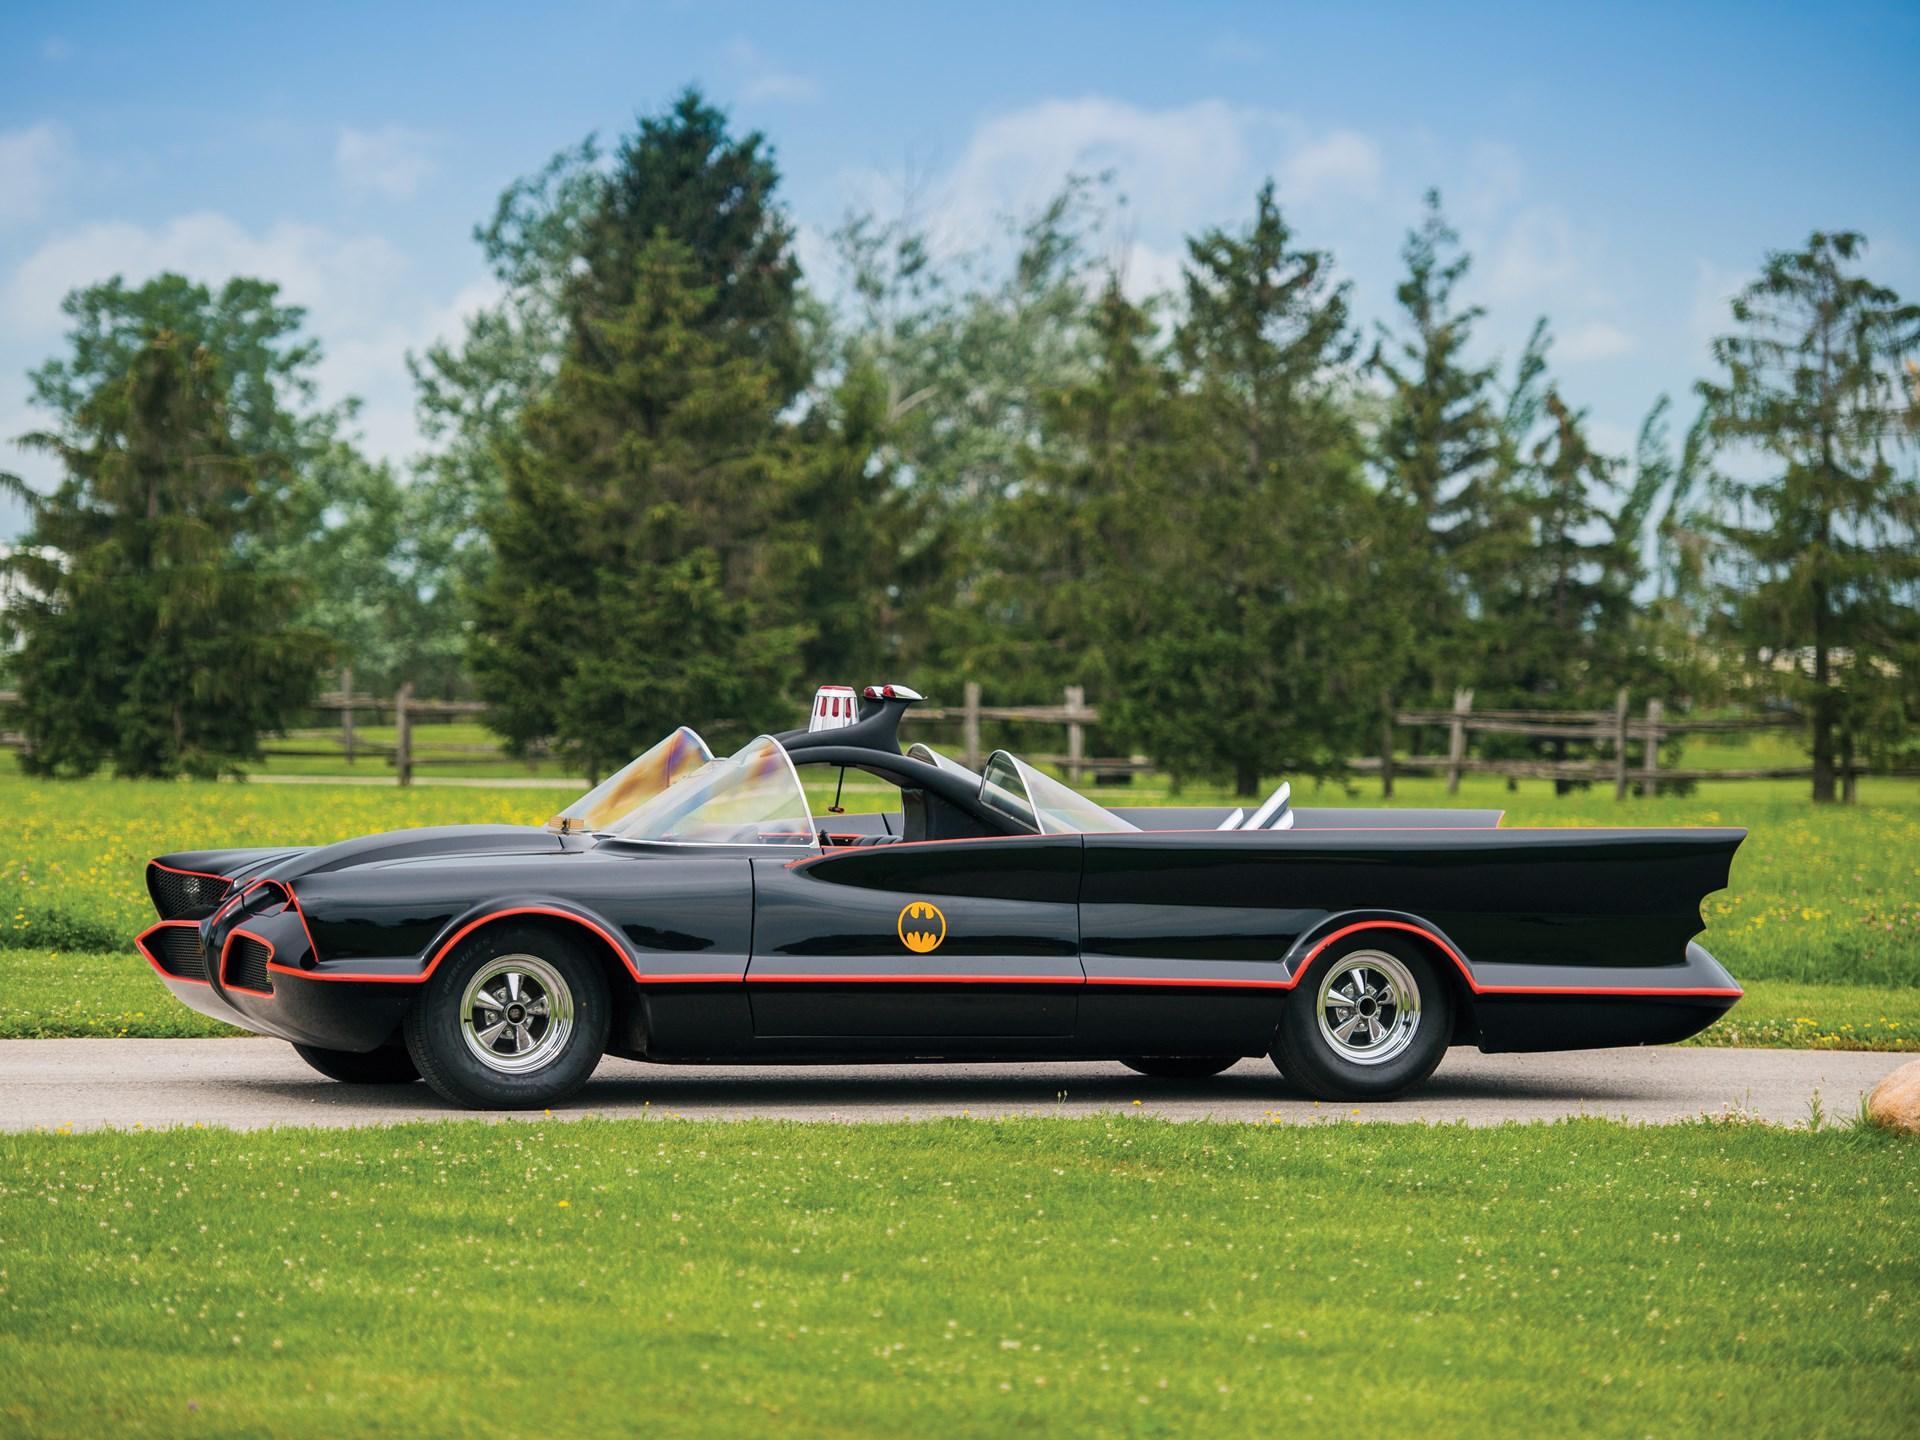 1966 Batmobile Recreation side profile